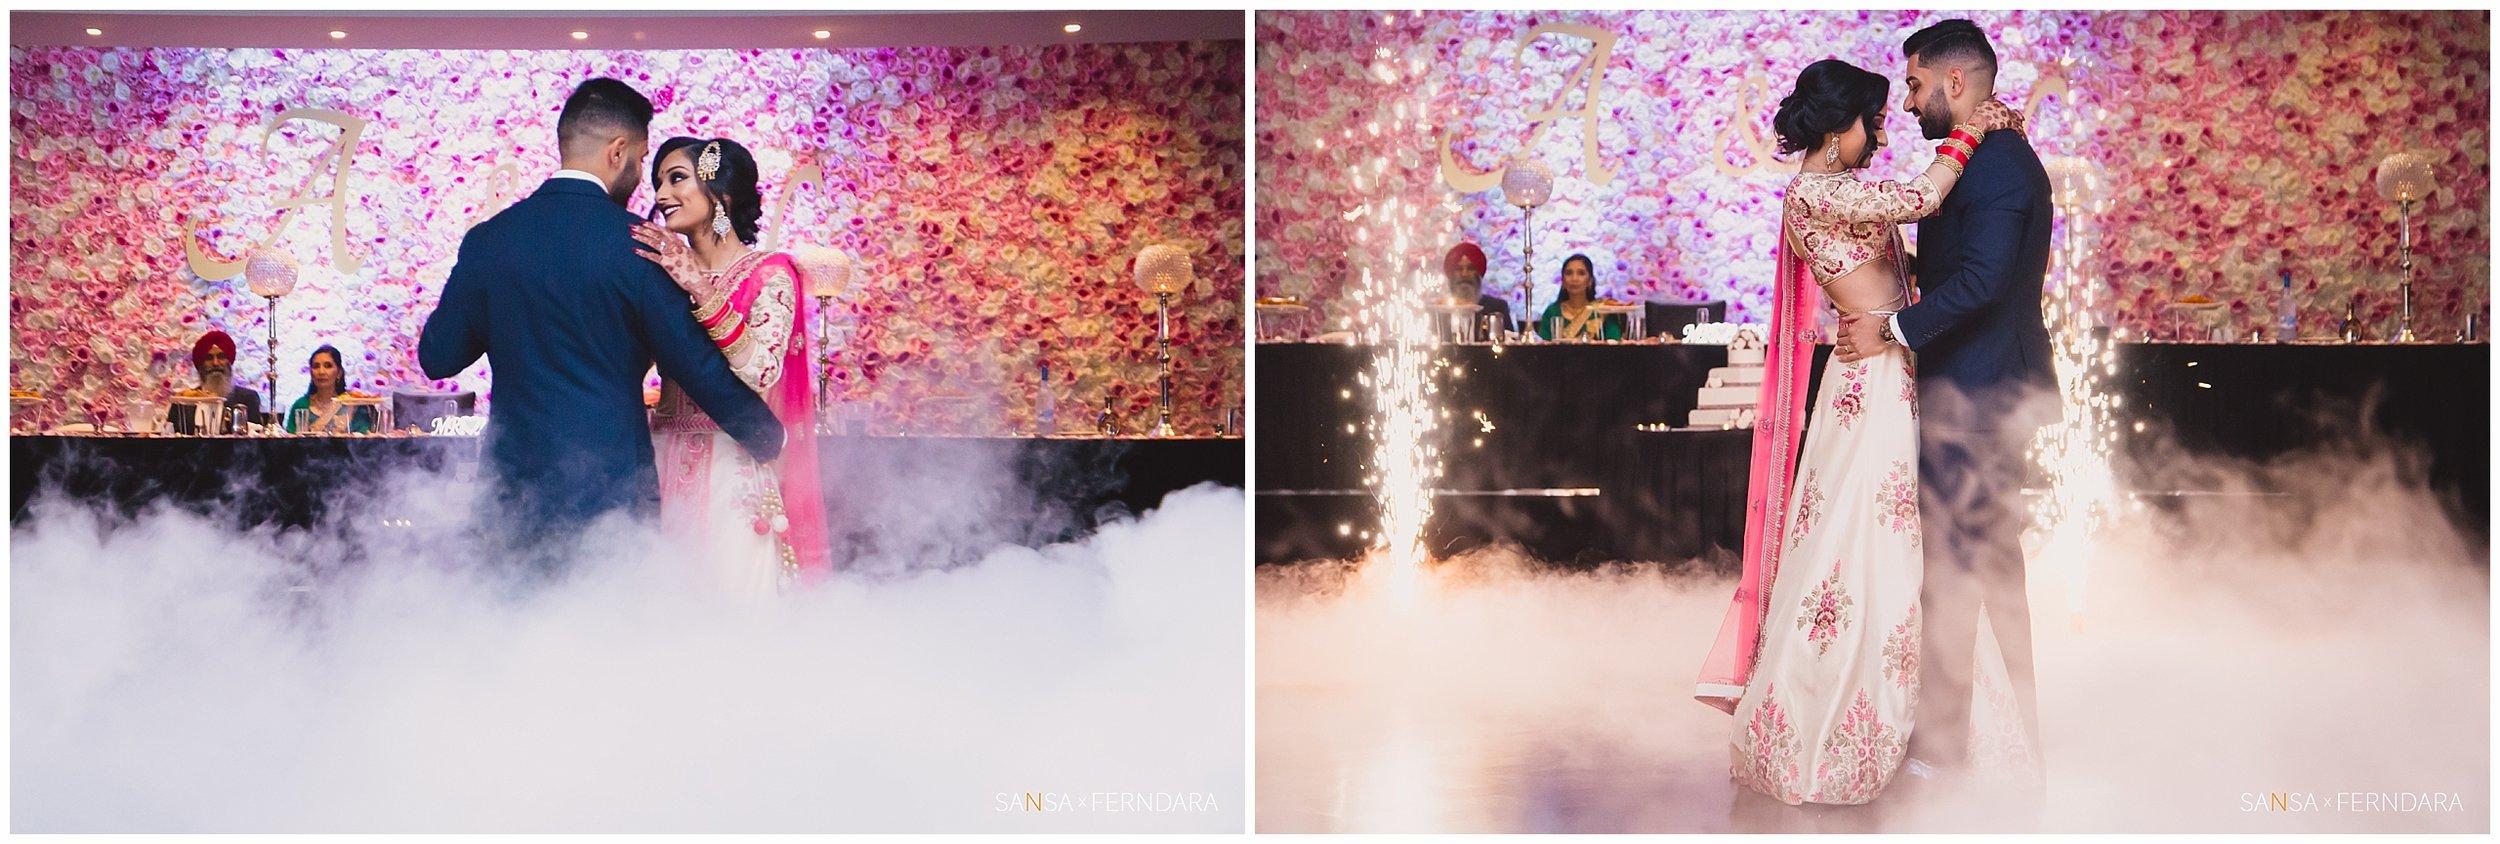 Indian Wedding Photography Melbourne - Ferndara